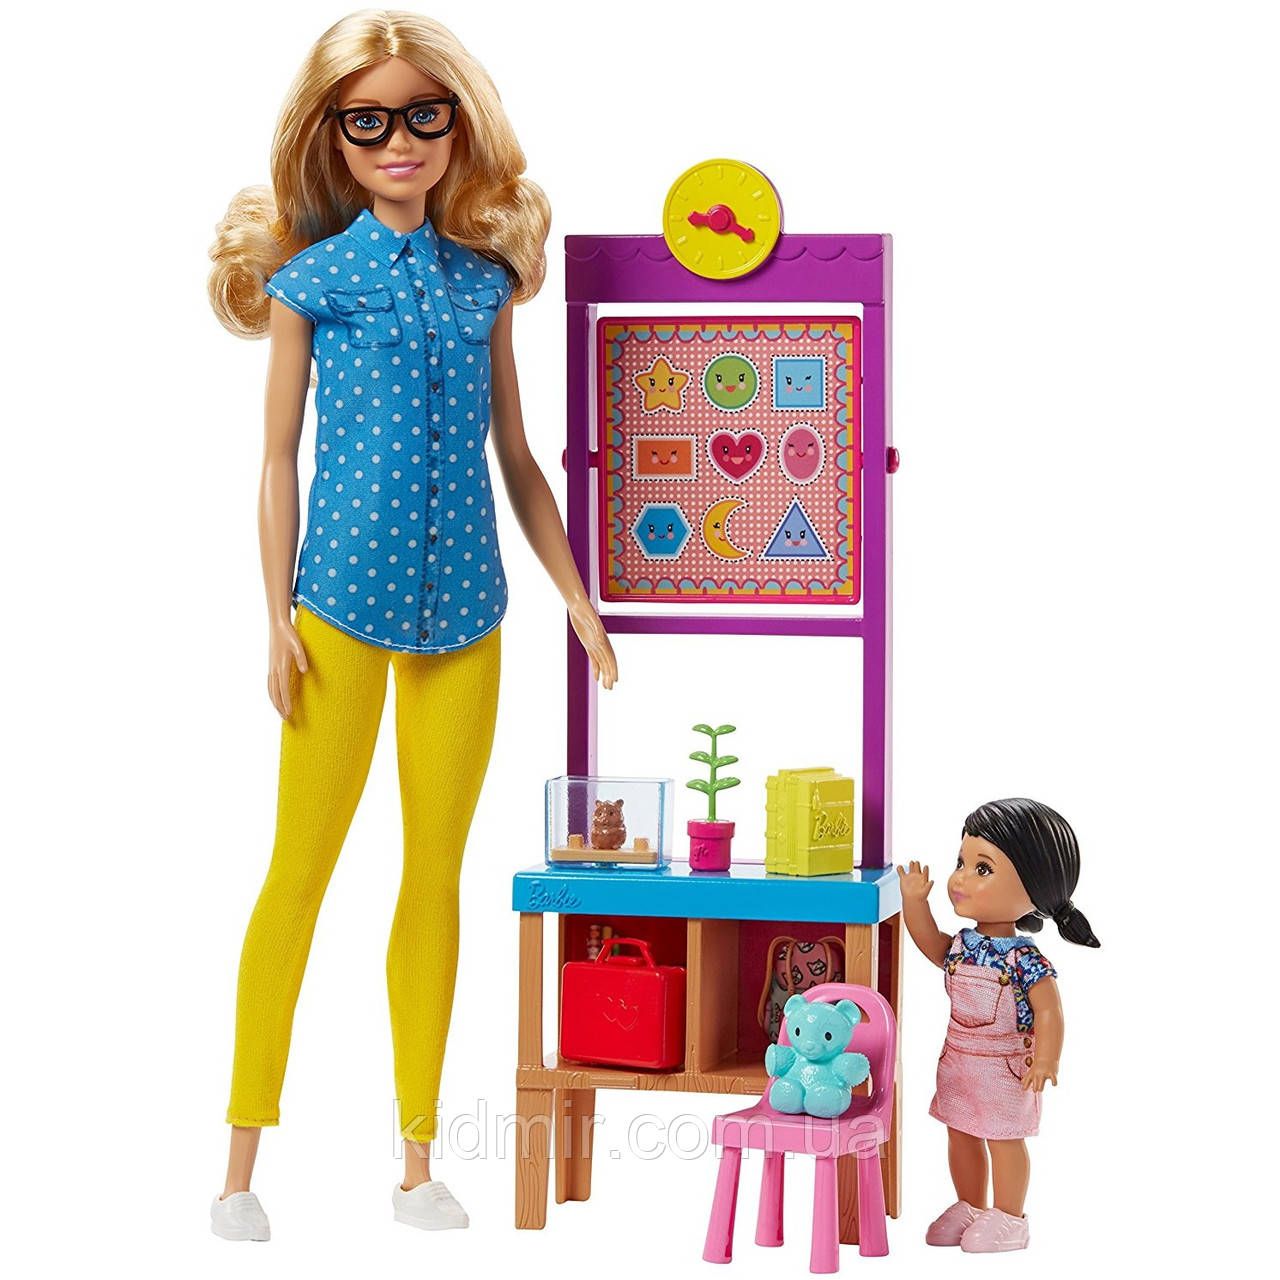 Кукла Барби Учитель Barbie Teacher FJB29